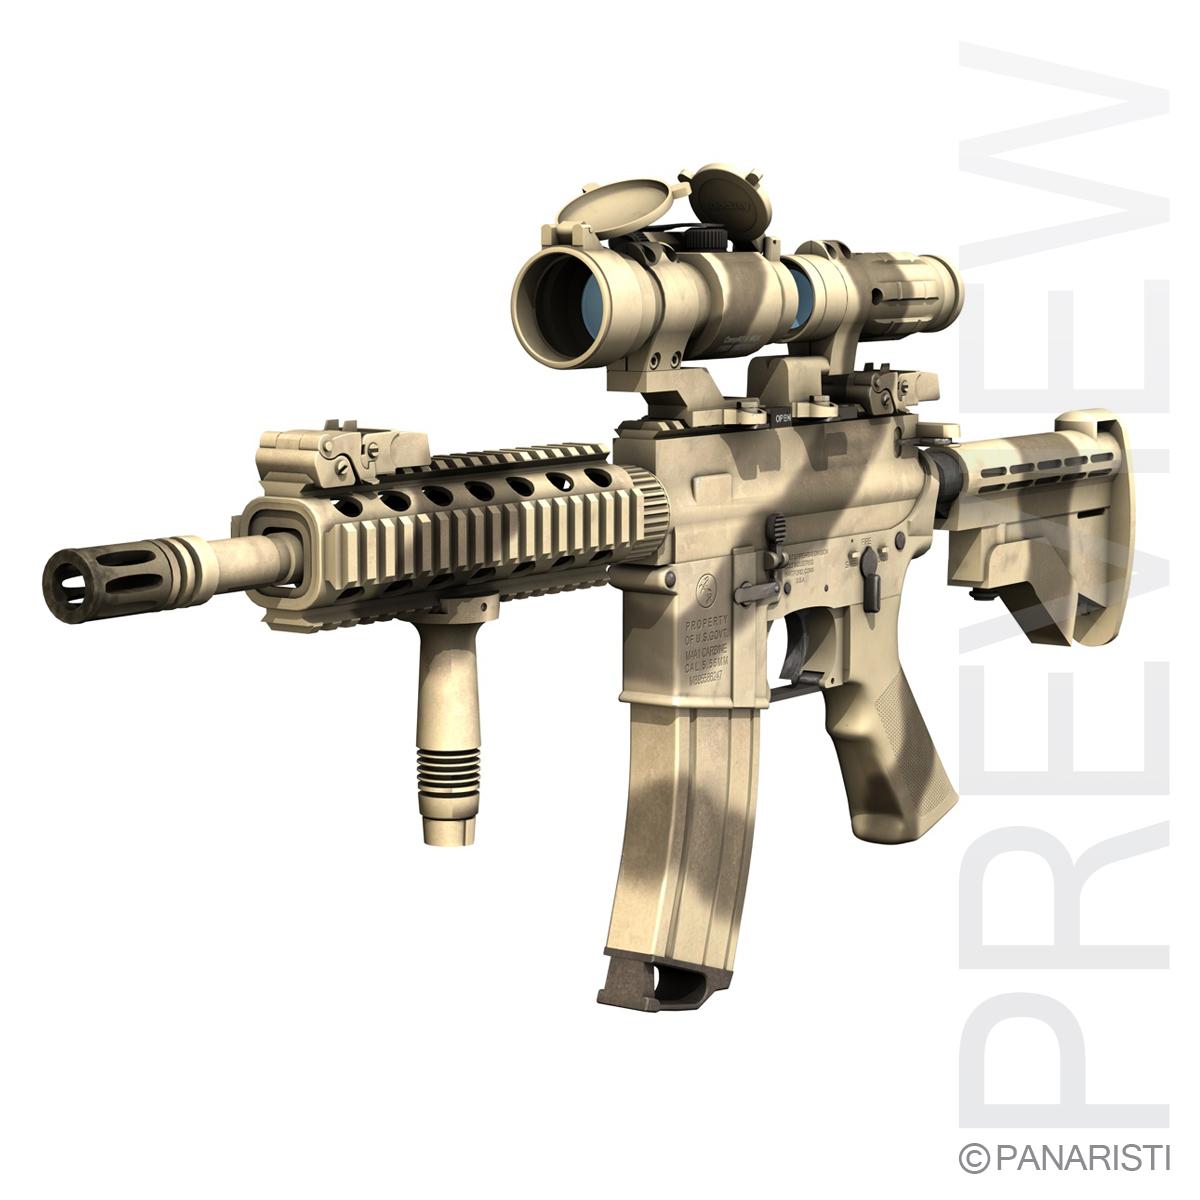 Colt M4A1 SOPMOD Aimpoint Desert Camo ( 354.21KB jpg by Panaristi )